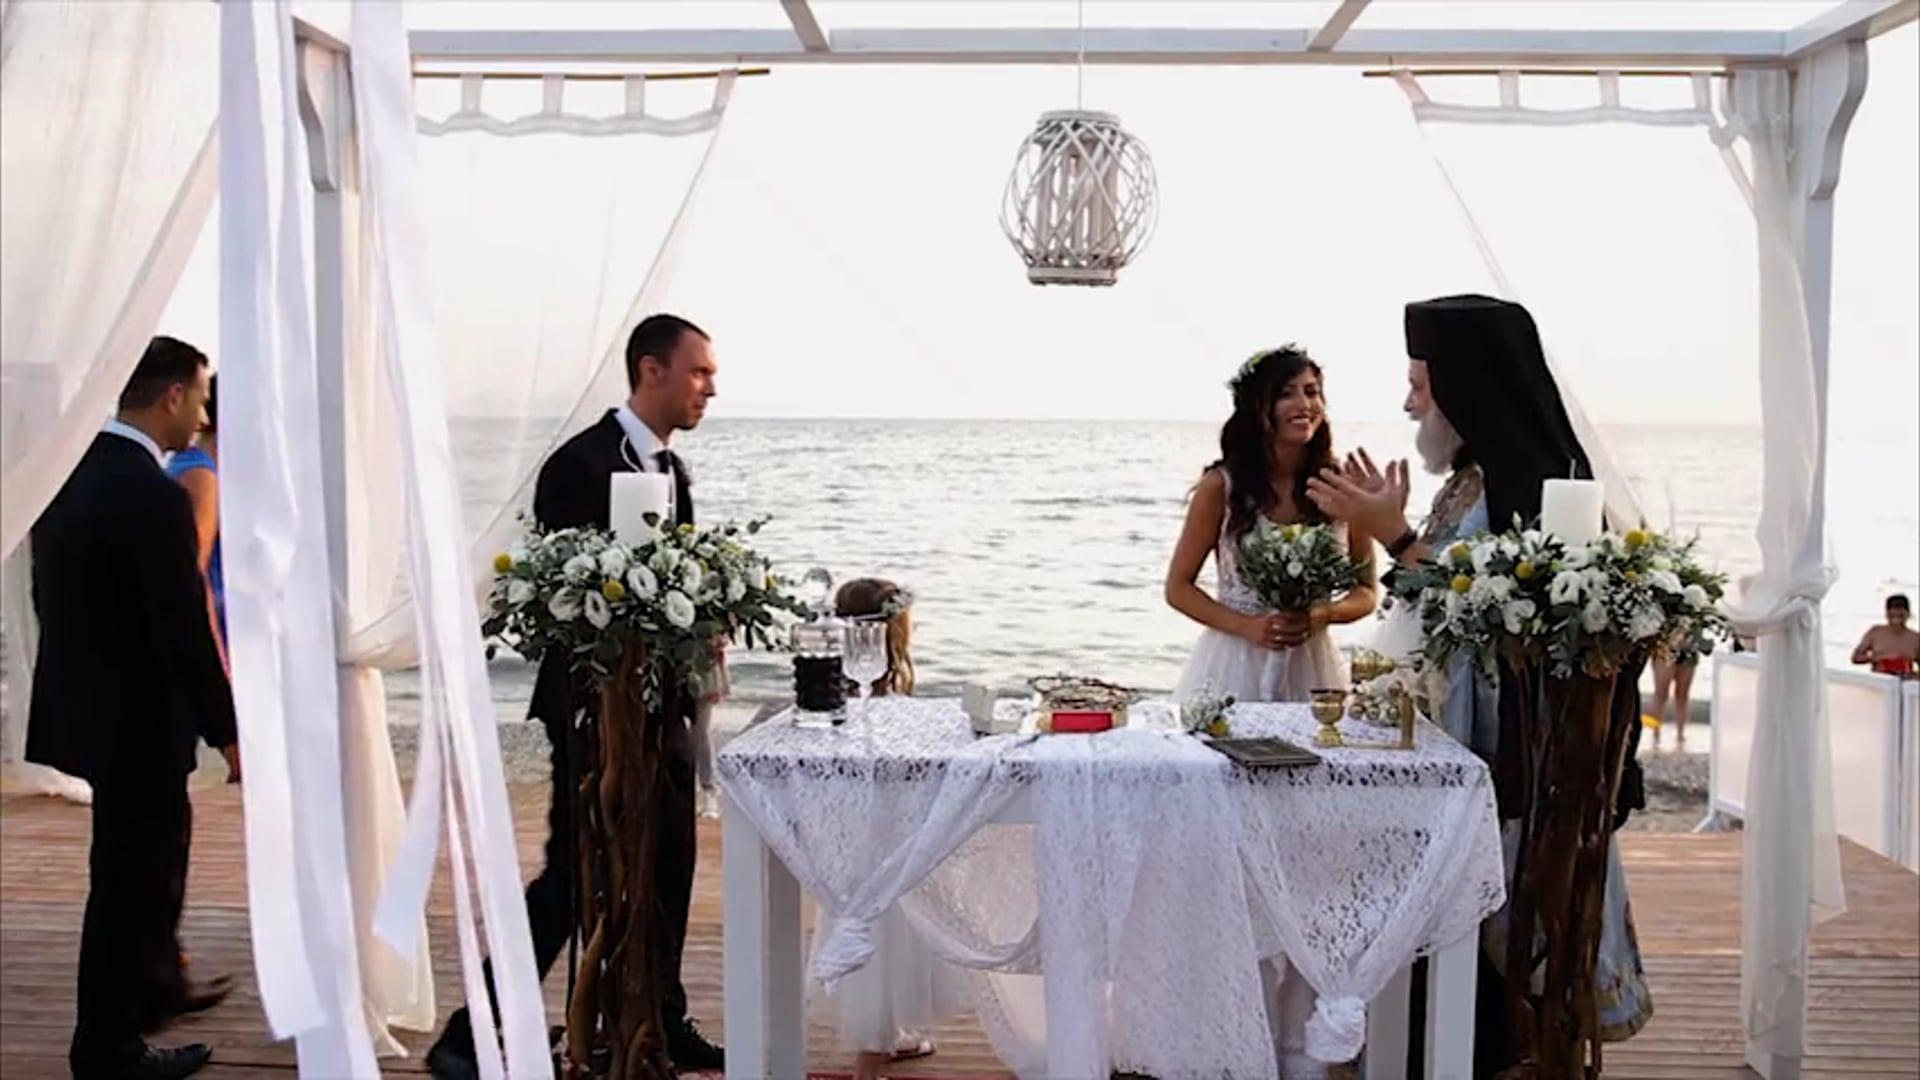 Teaser wedding clip, Beach Wedding @ Athens Riviera, Summer 2019. Say WOW!